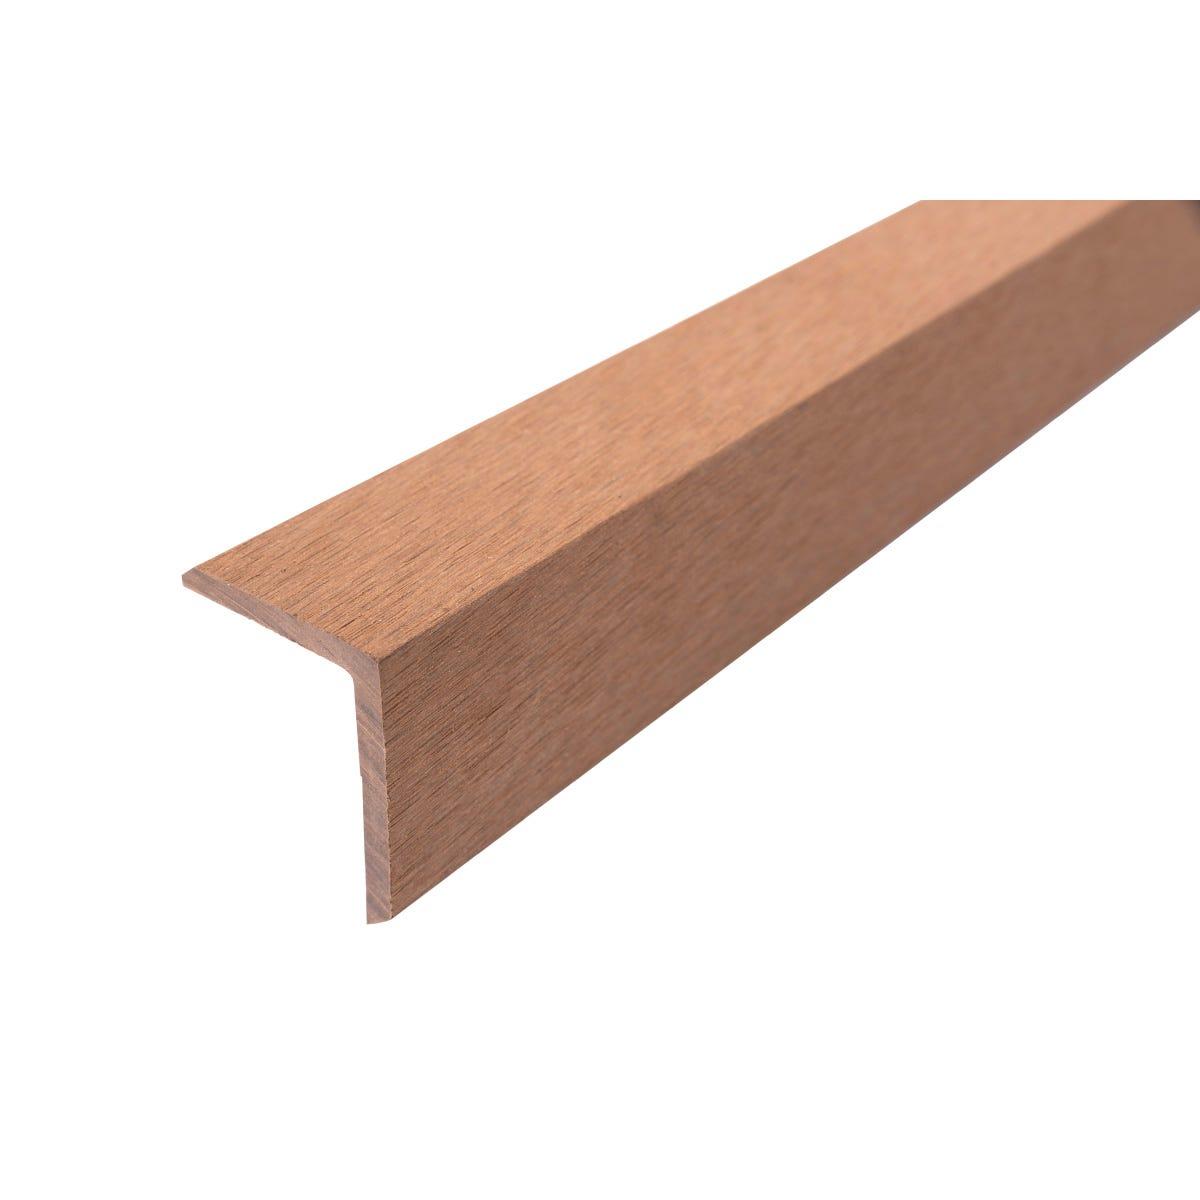 Select Composite Decking 1.8m Corner Trim 5pcs- Teak